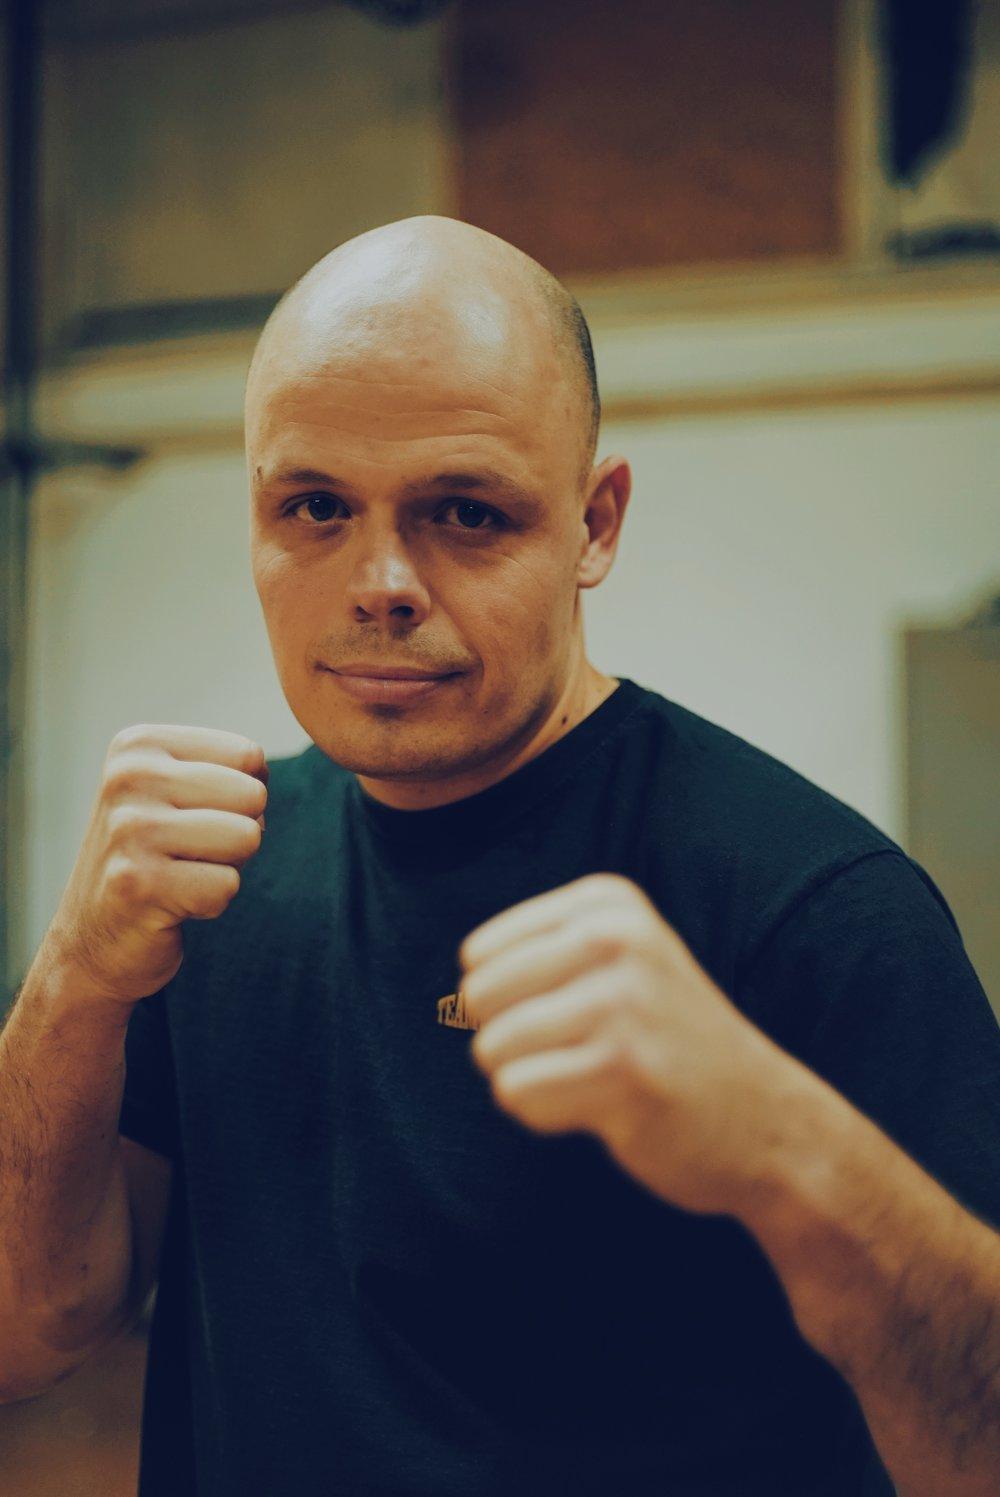 anras_hizo_boxing_trainer_brighton.jpg